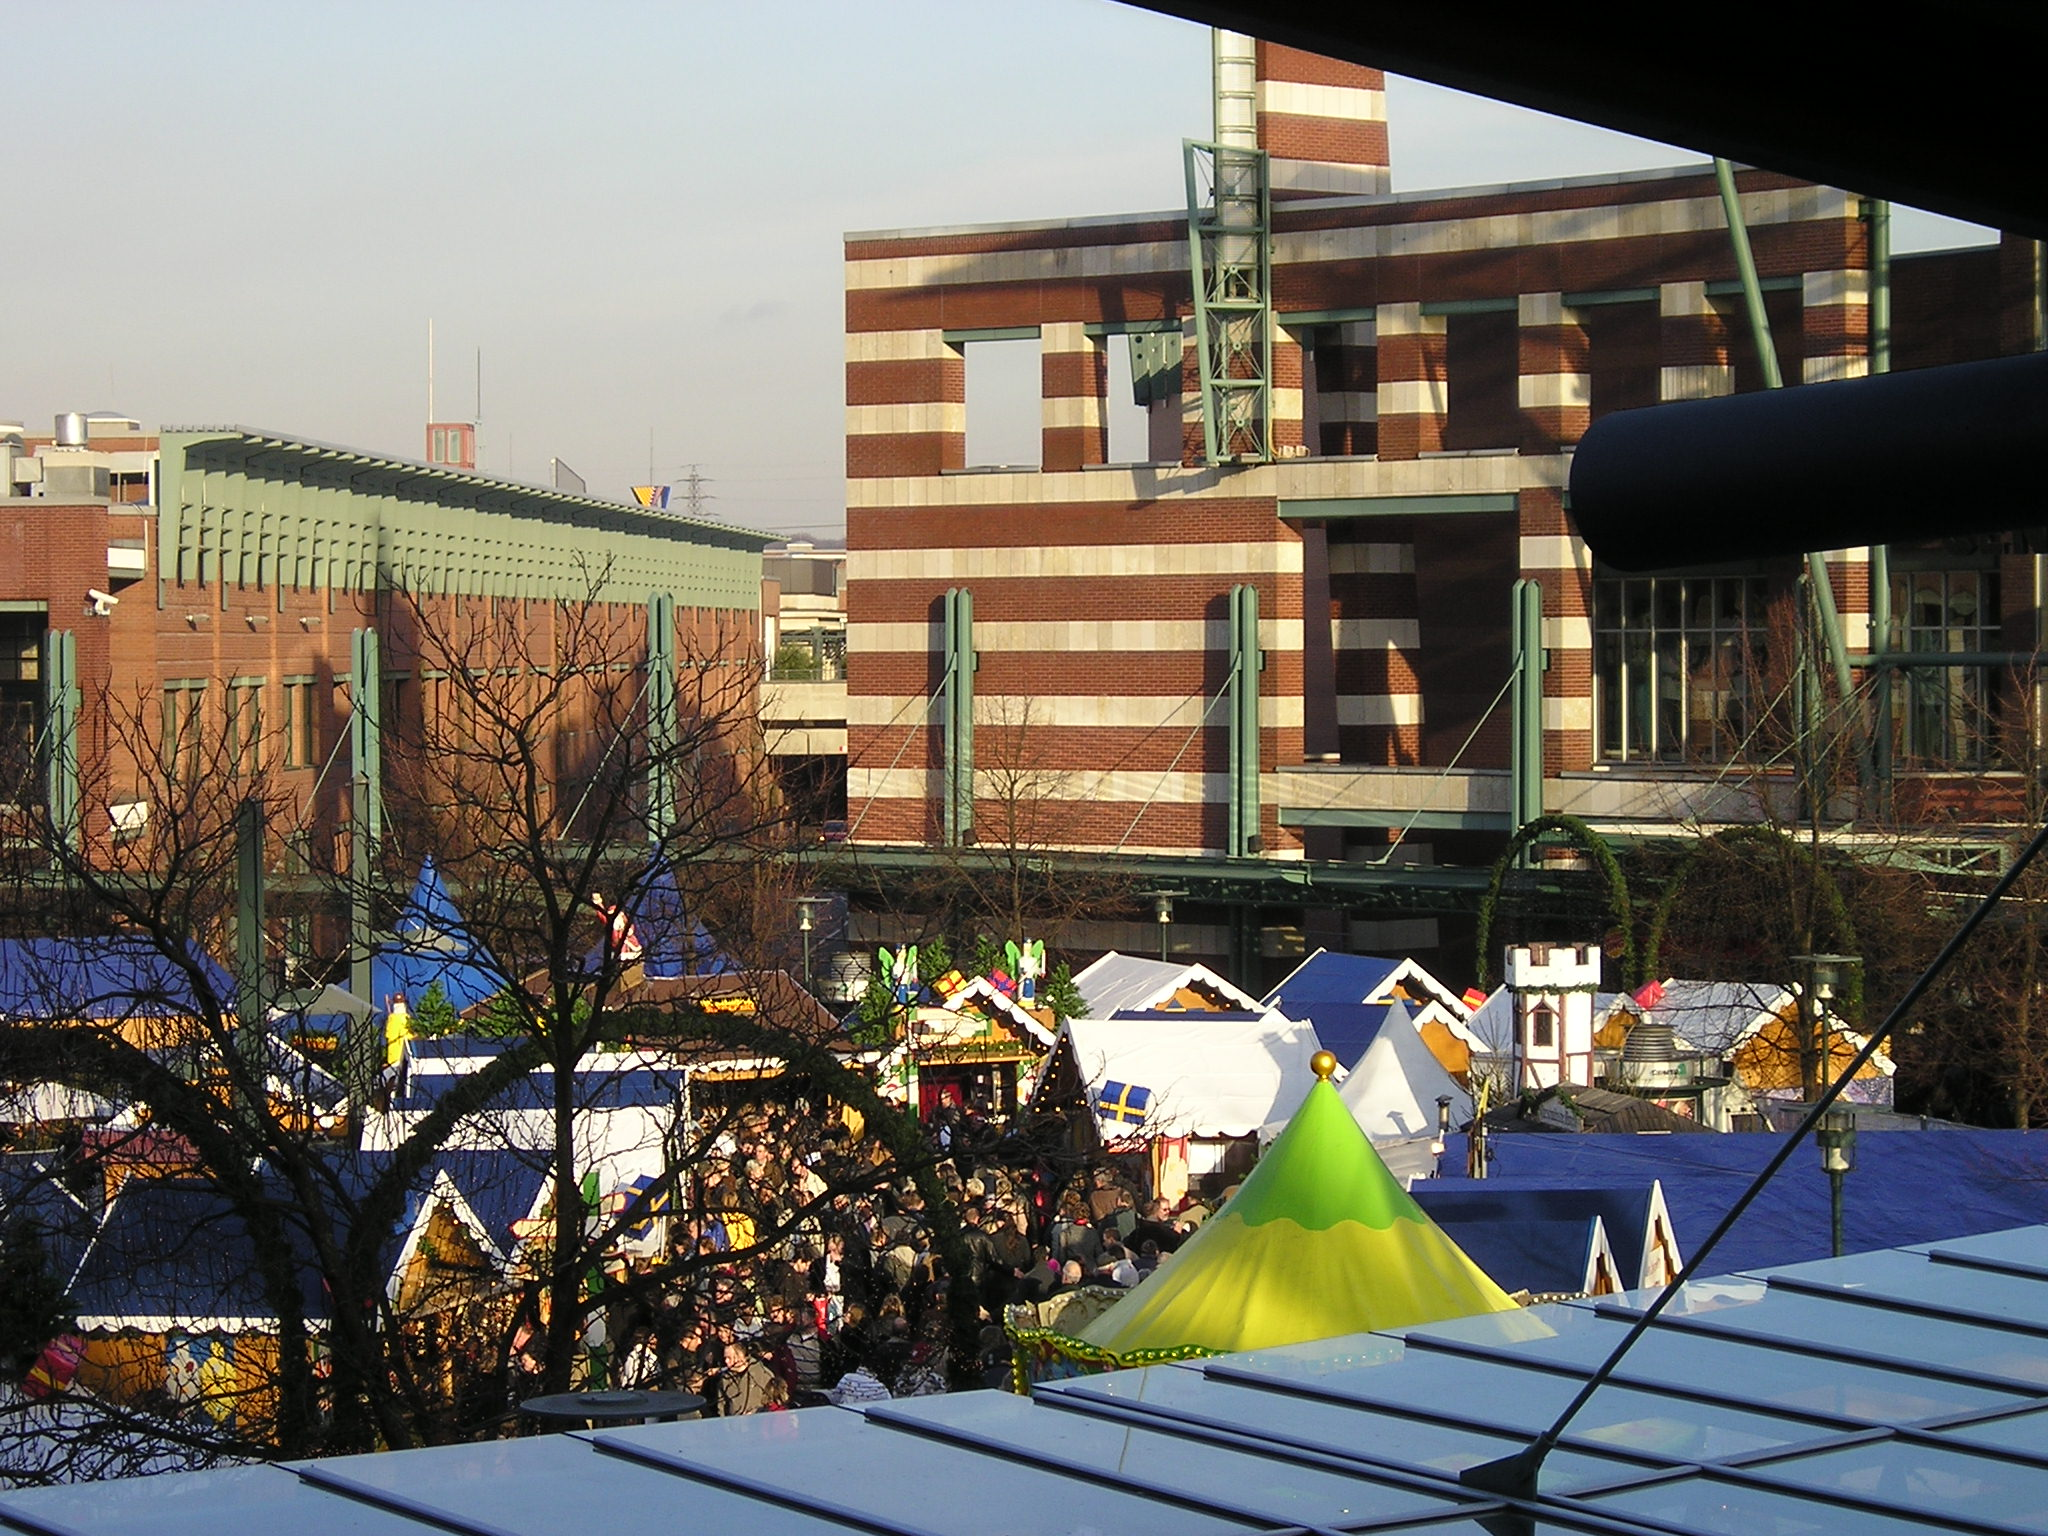 File Weihnachtsmarkt Am Centro 2007 Jpg Wikimedia Commons